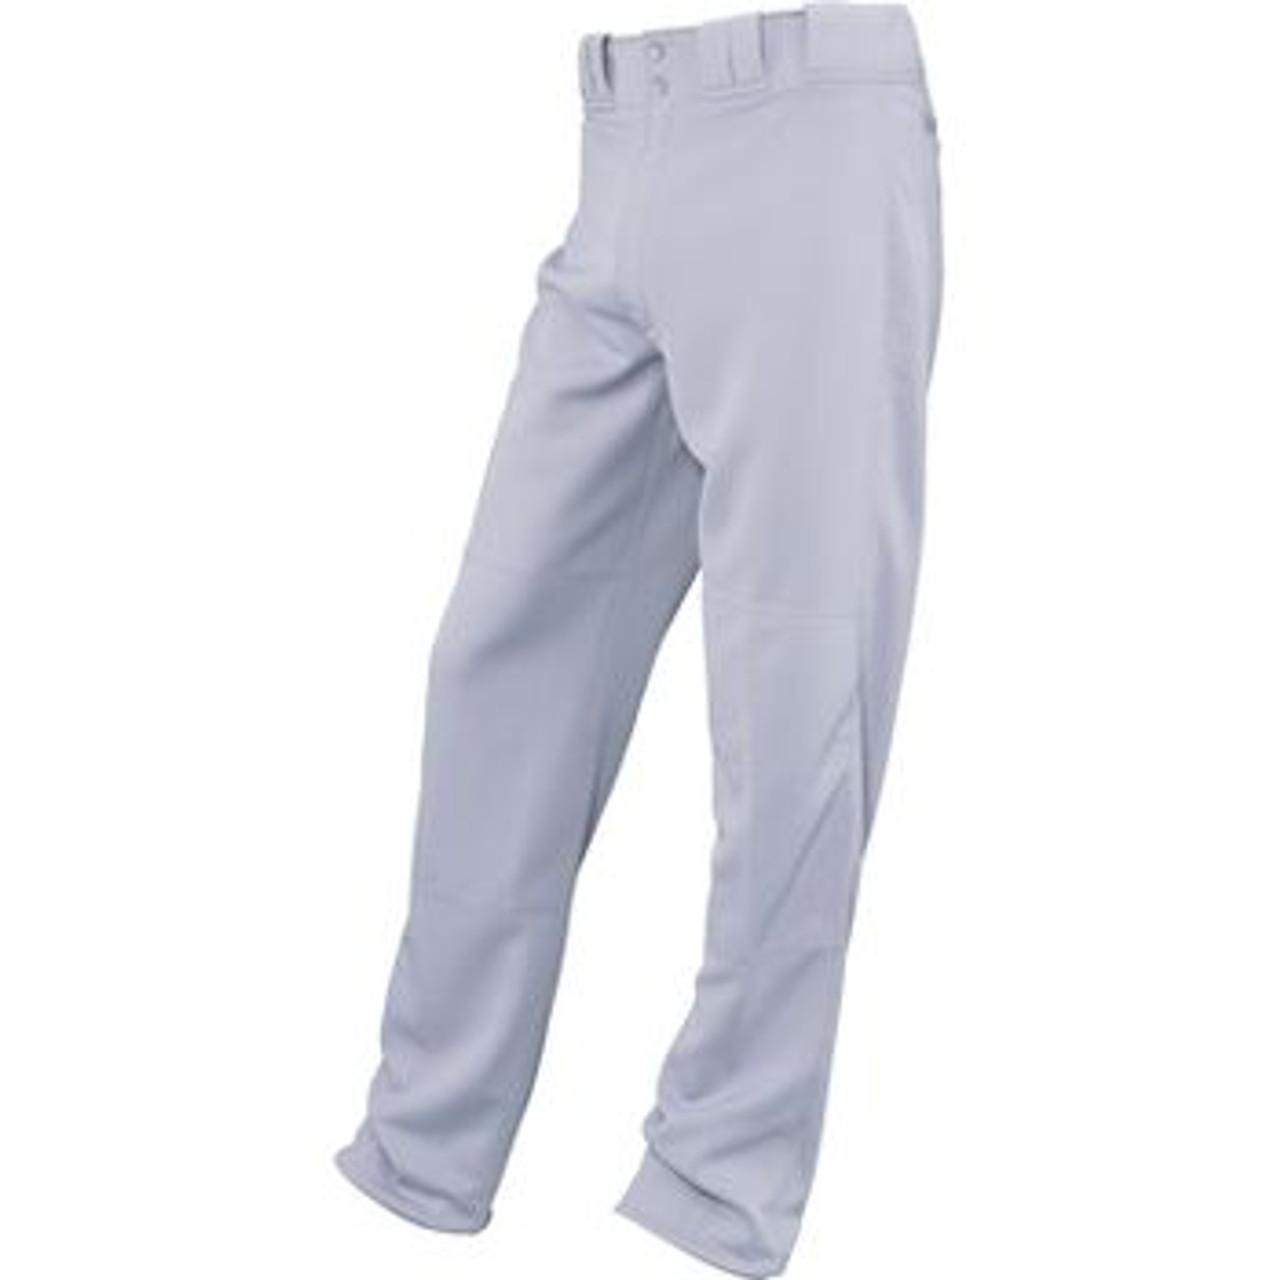 Easton Rival Adult Rival Baseball Pant Grey M